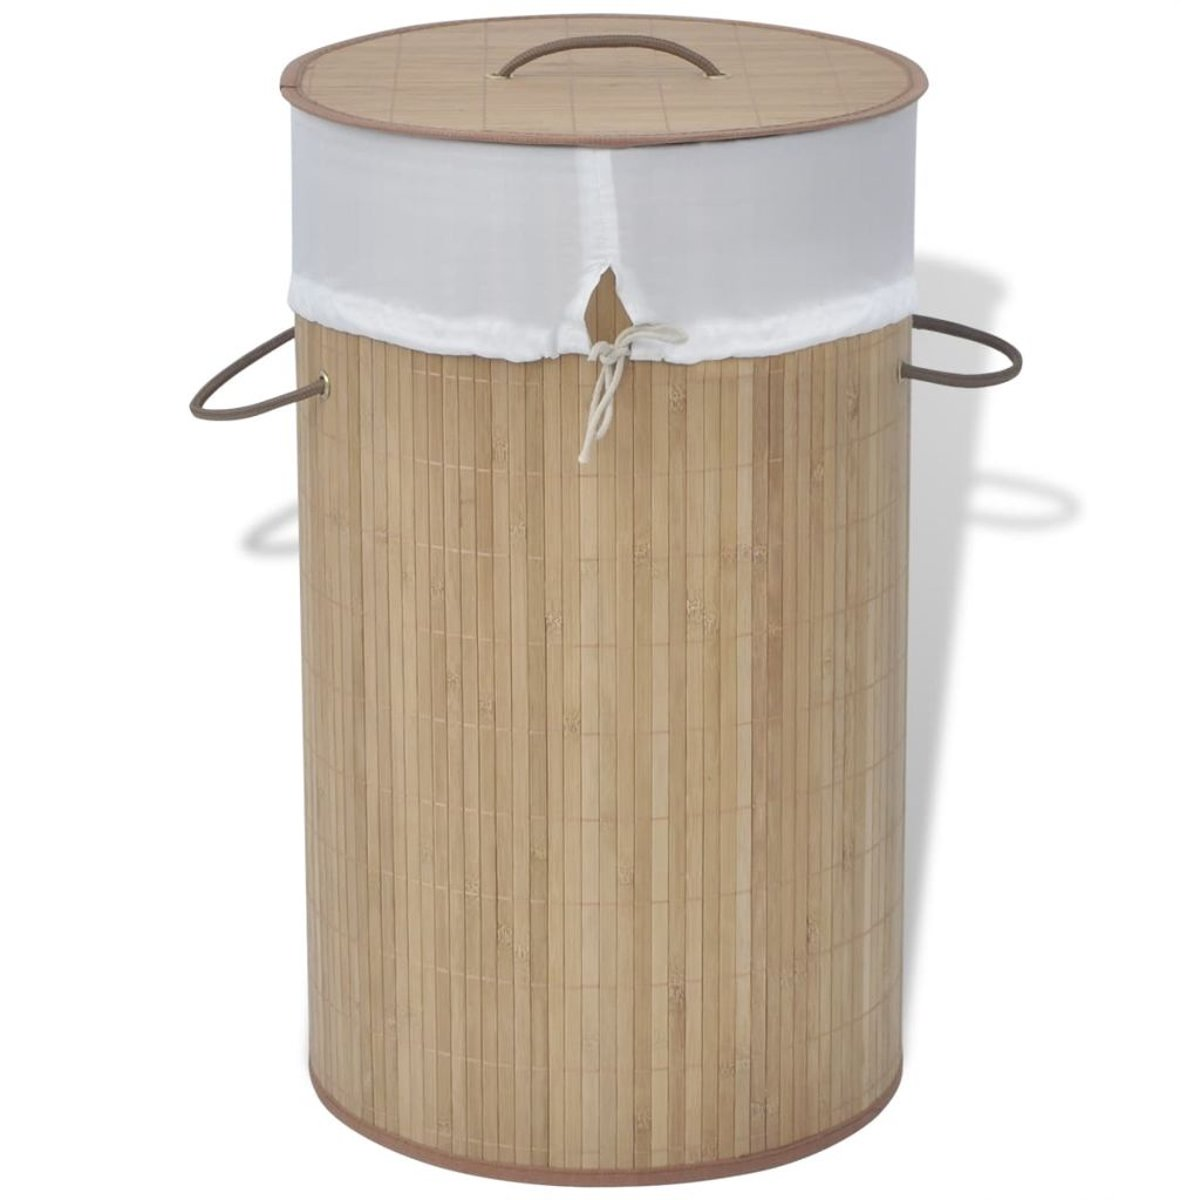 Wasmand rond bamboe natuurlijk